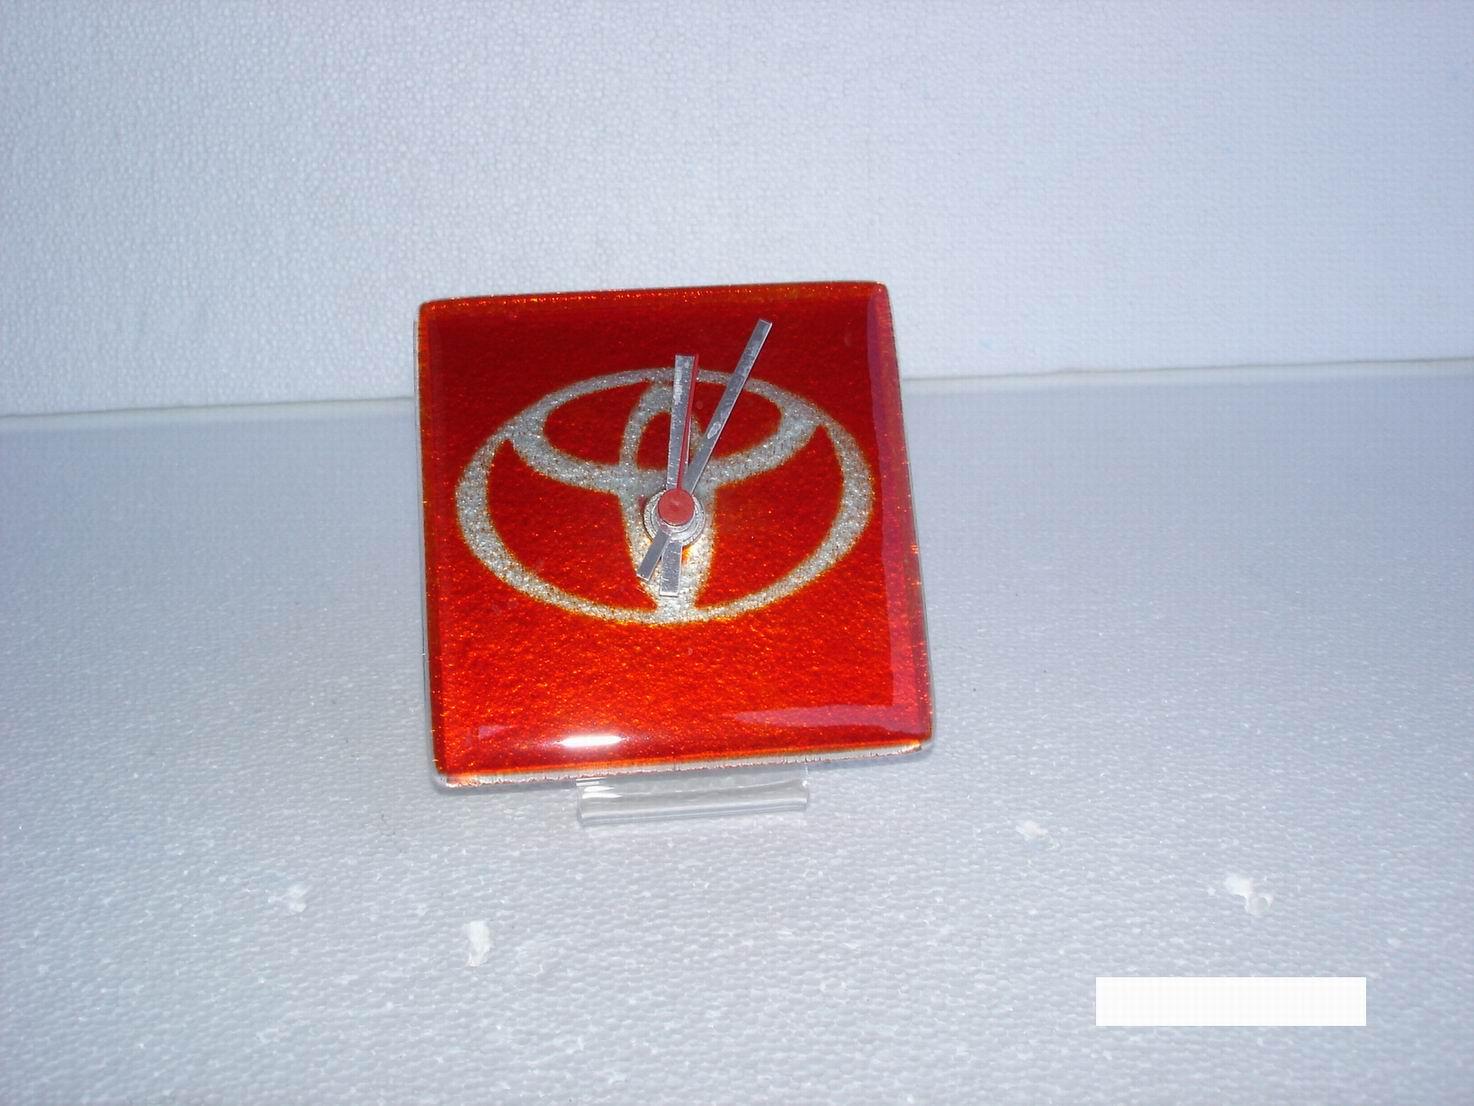 Custom Made tableClock with logo of Toyota Car Company